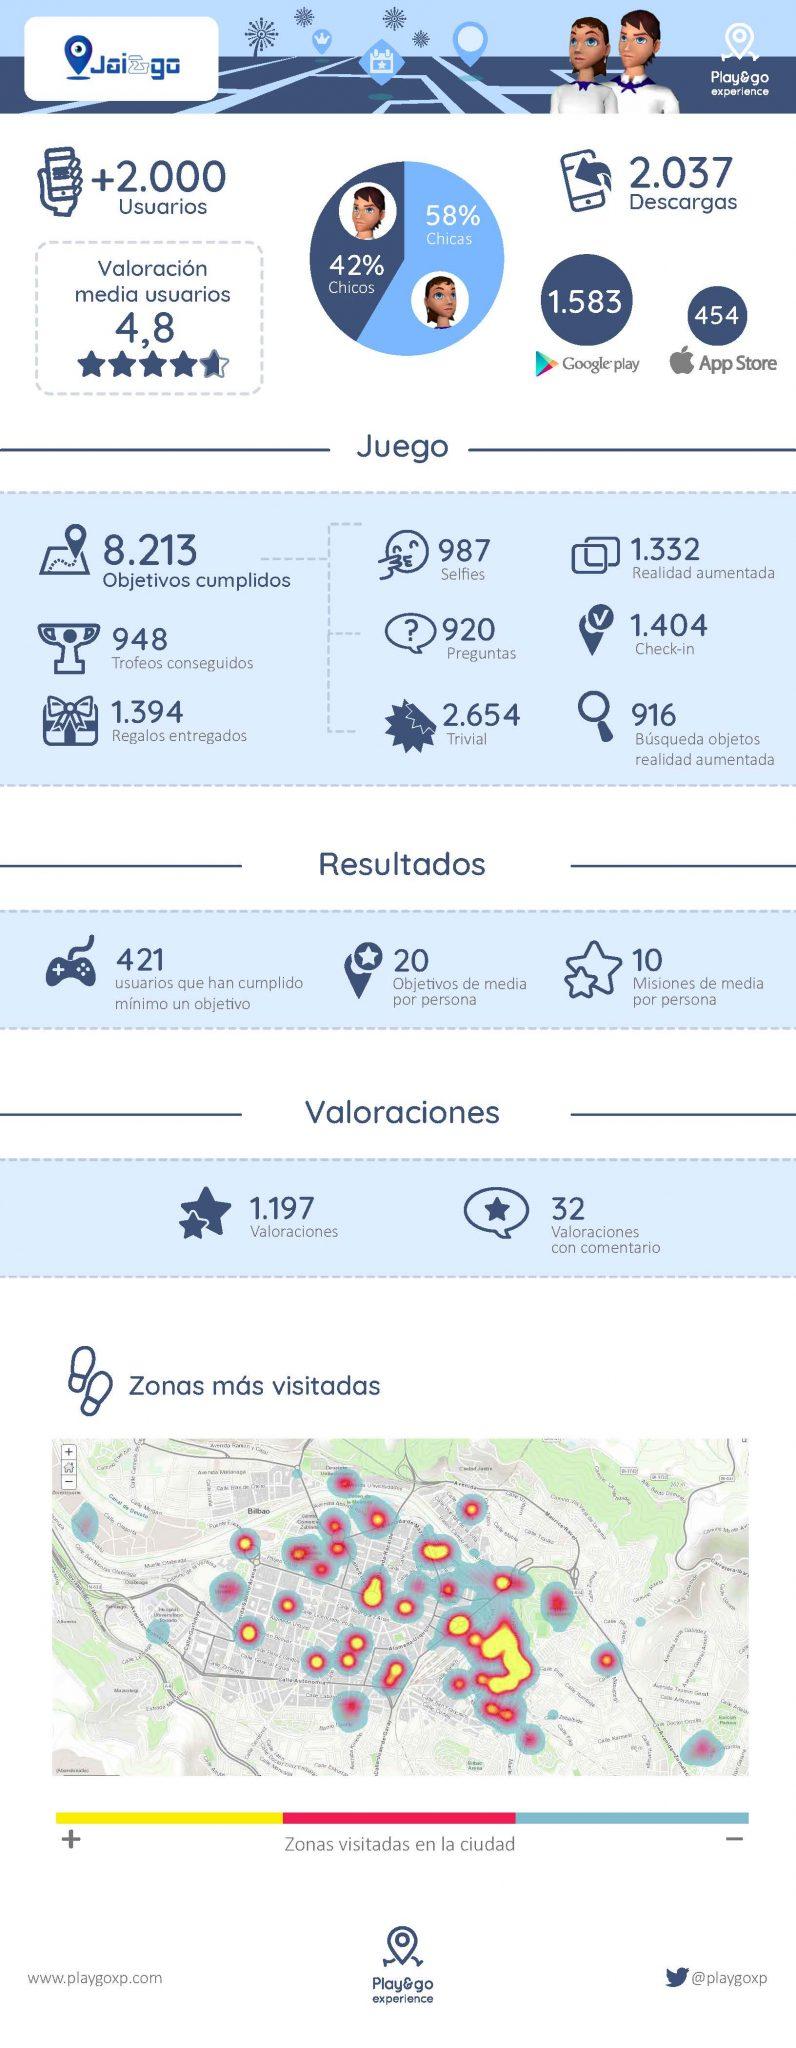 Infografía resultados Jai&go